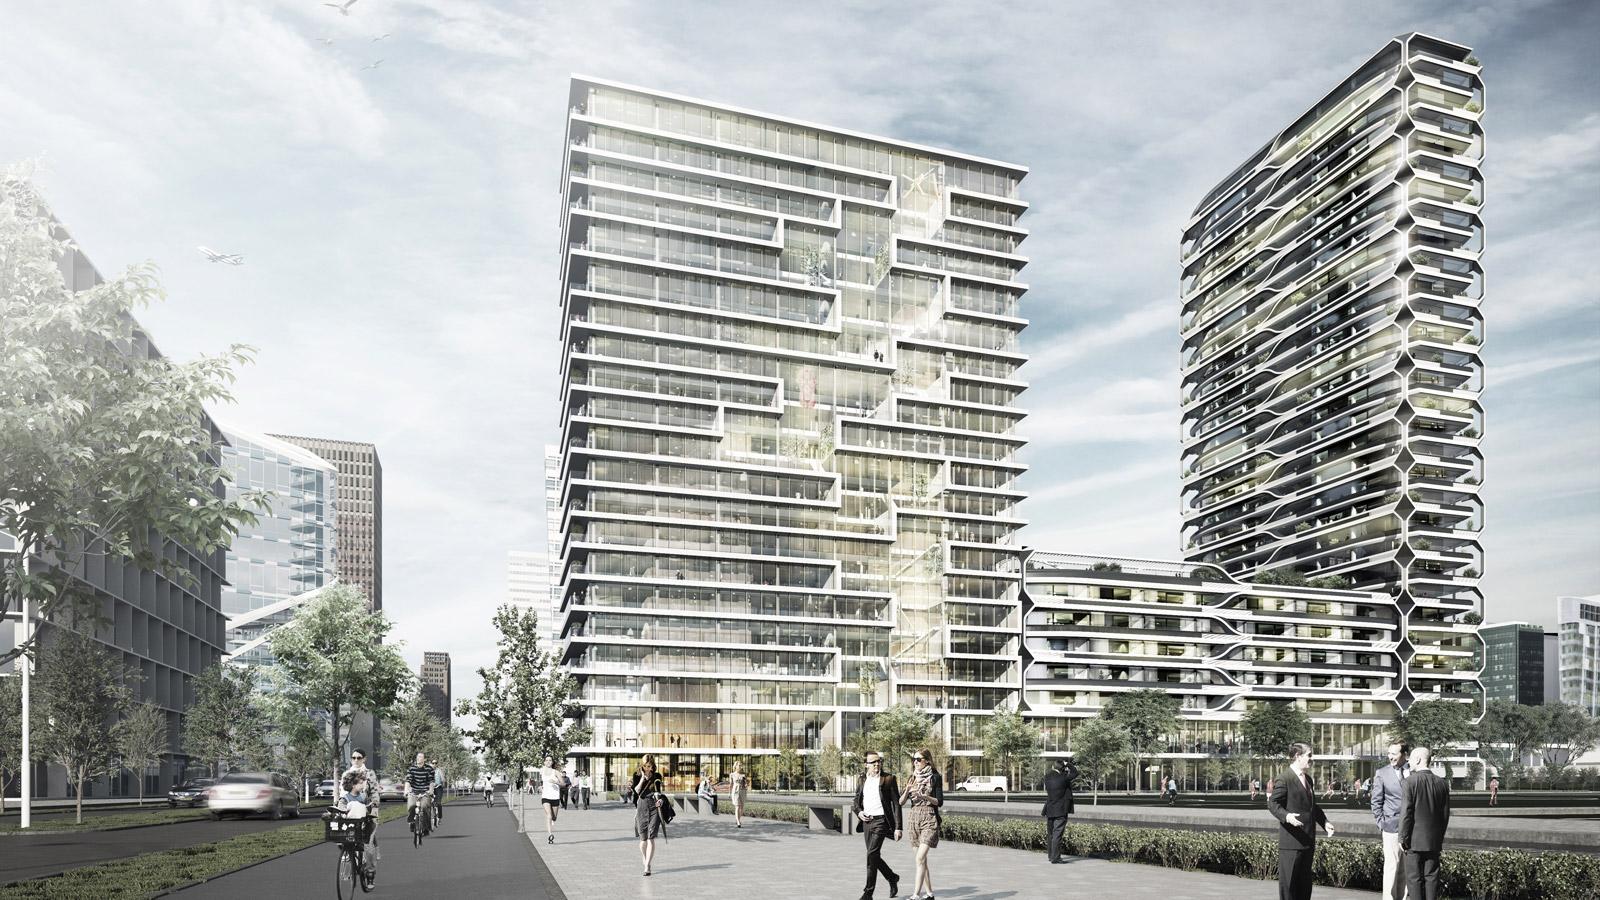 Oz architecture urbanism and design research